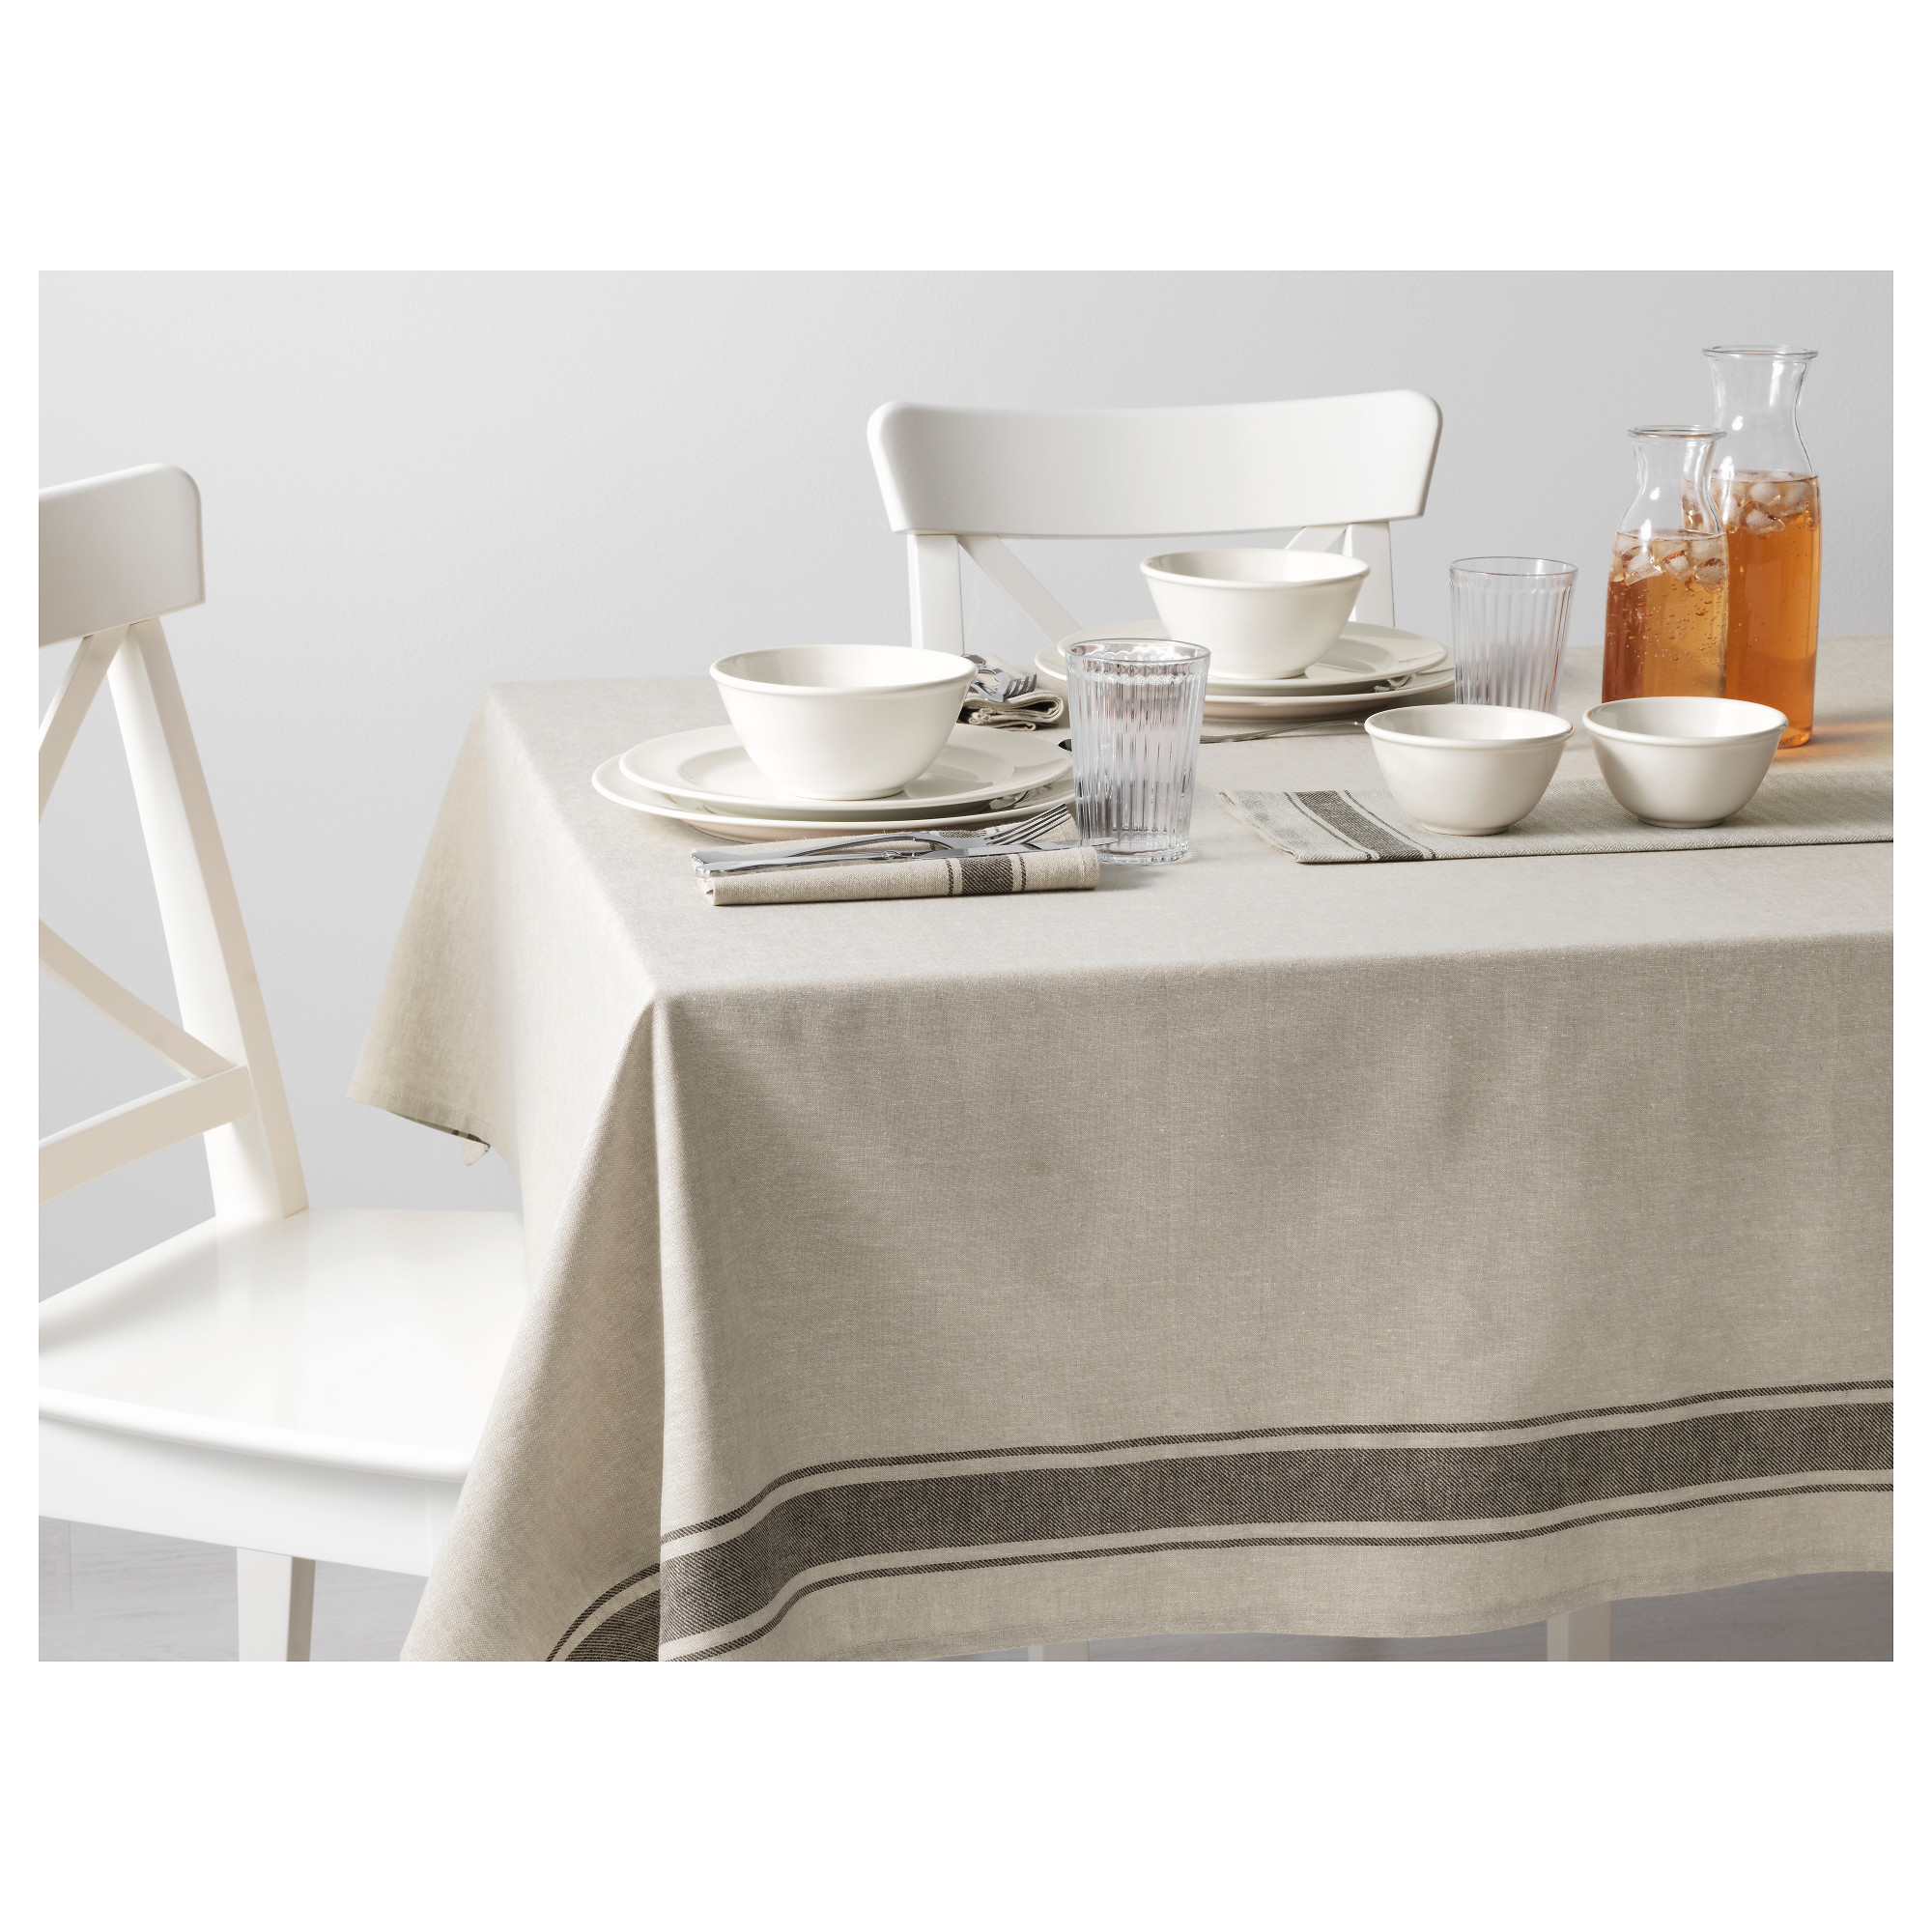 Ikea Usa All Products: IKEA - VARDAGEN Tablecloth Beige